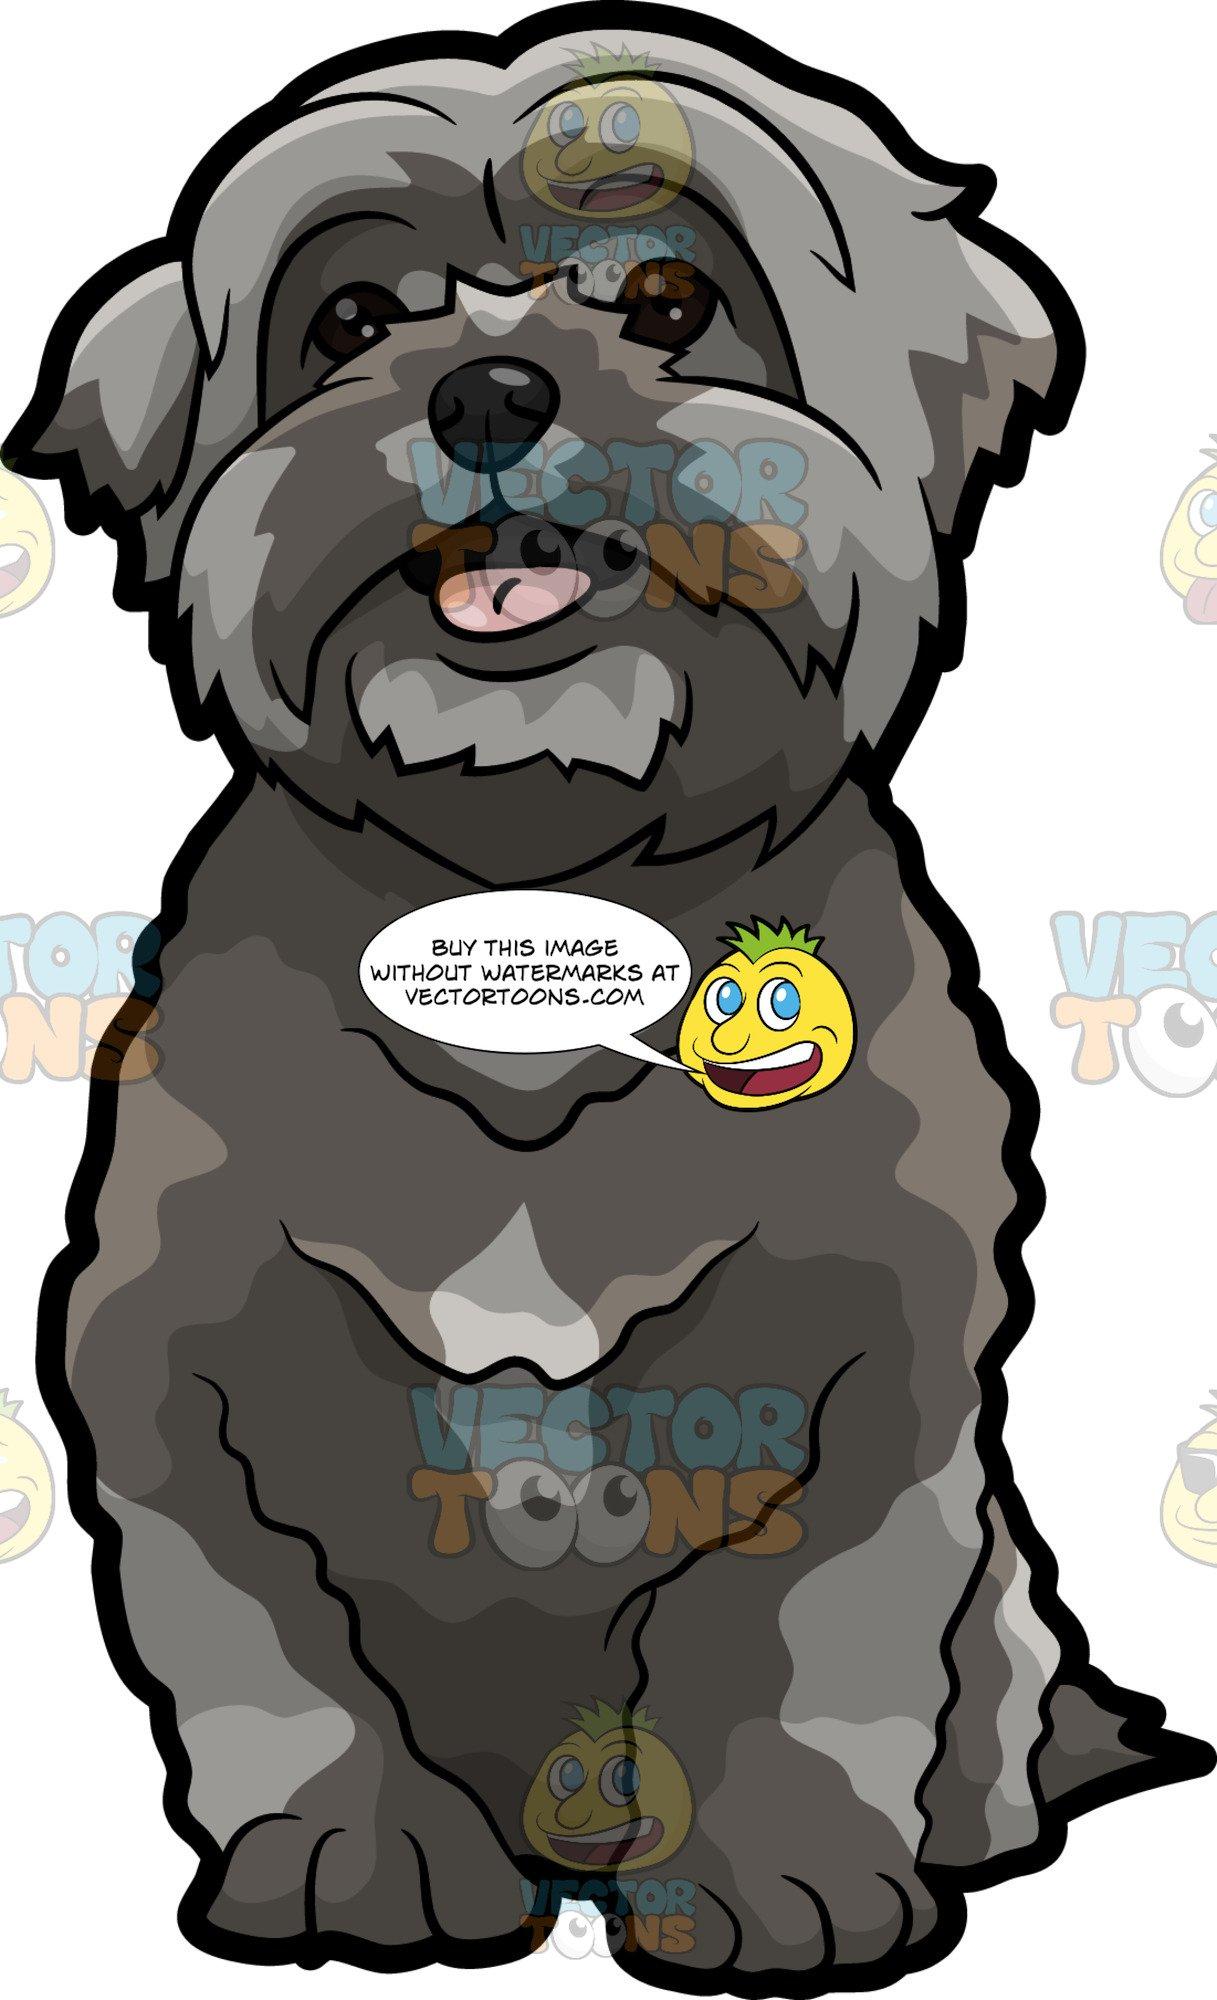 Shih tzu puppies clipart clip black and white download A Super Cute Shih Tzu Puppy clip black and white download